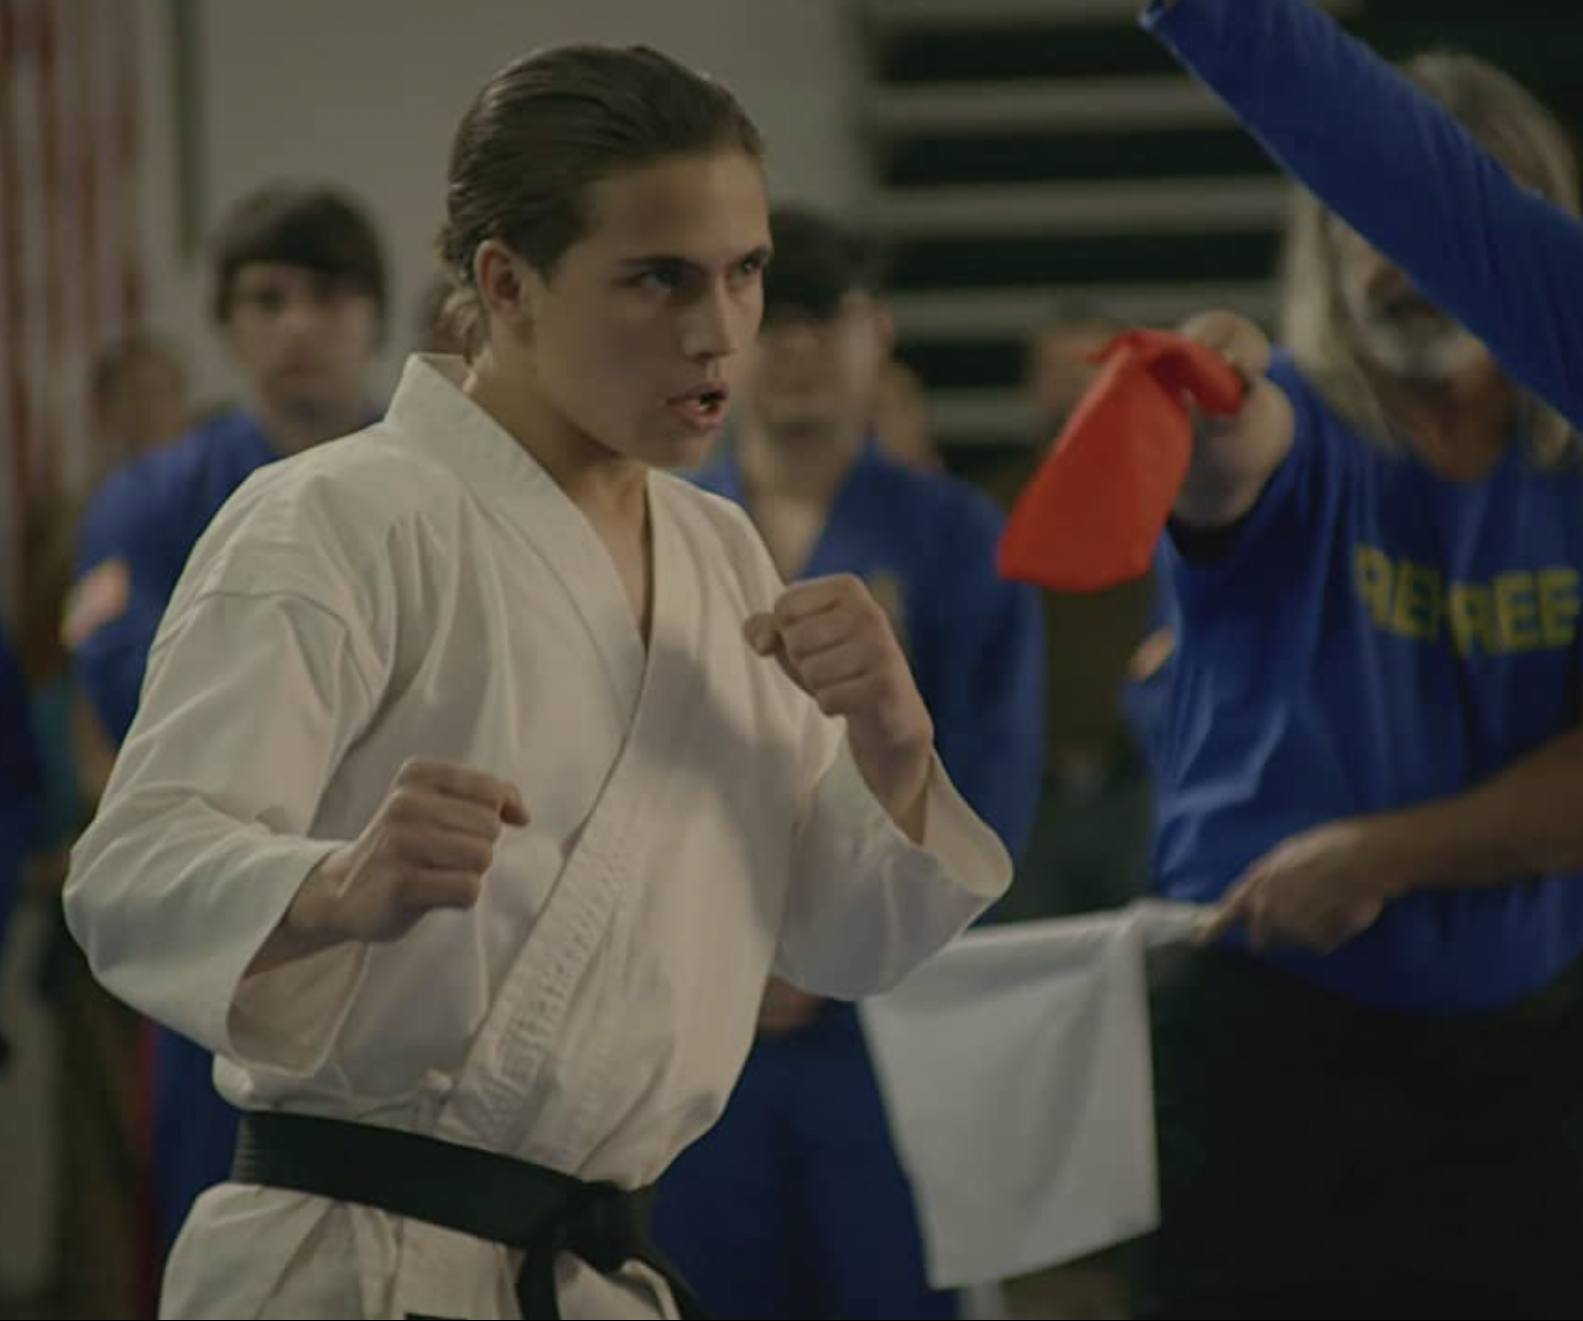 Screenshot 2021 05 06 at 09.38.45 e1620290571545 Cobra Kai Proves Daniel Was The Real Villain Of Karate Kid All Along